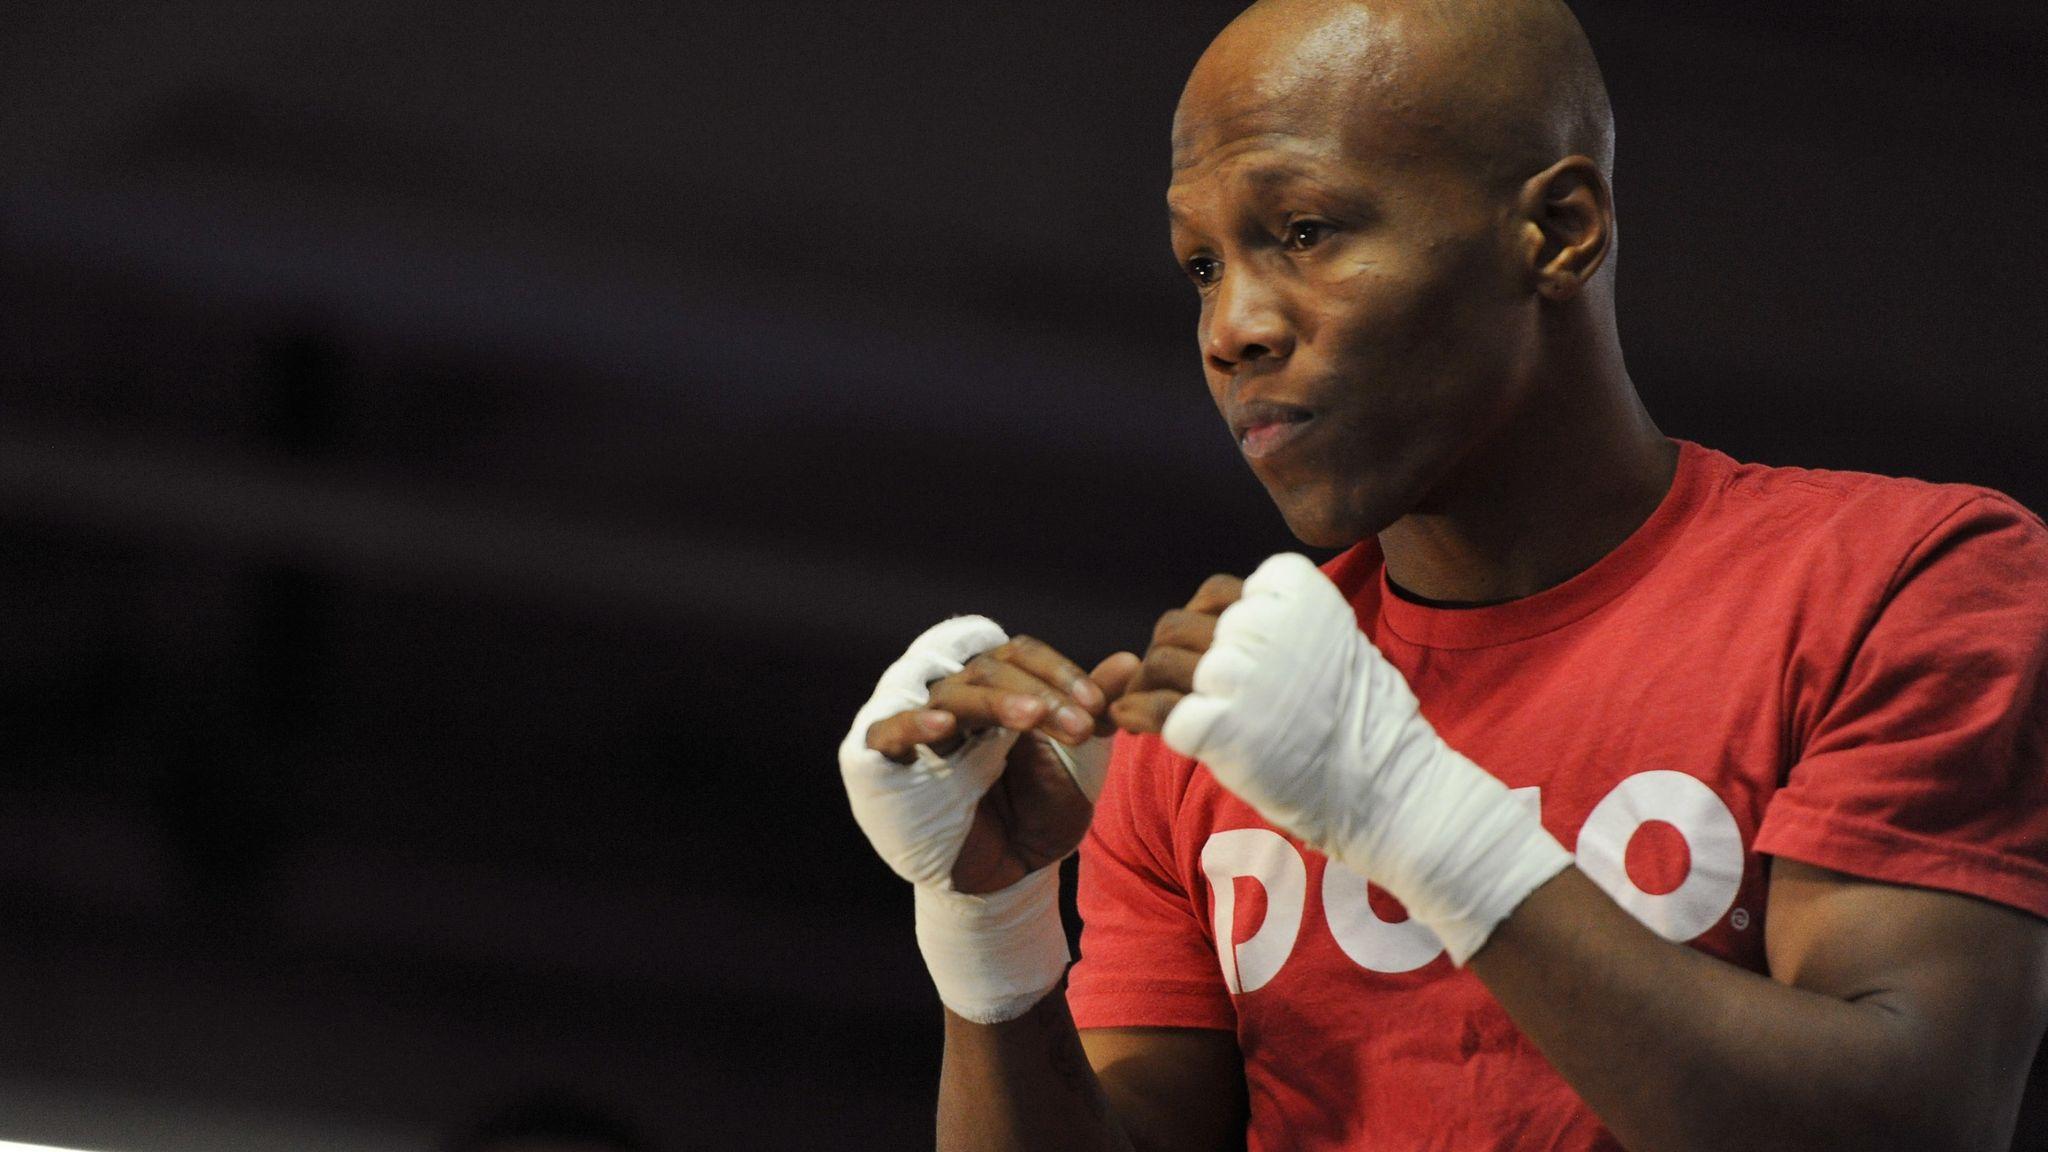 Former world champion Zab Judah remains hospitalised after knockout